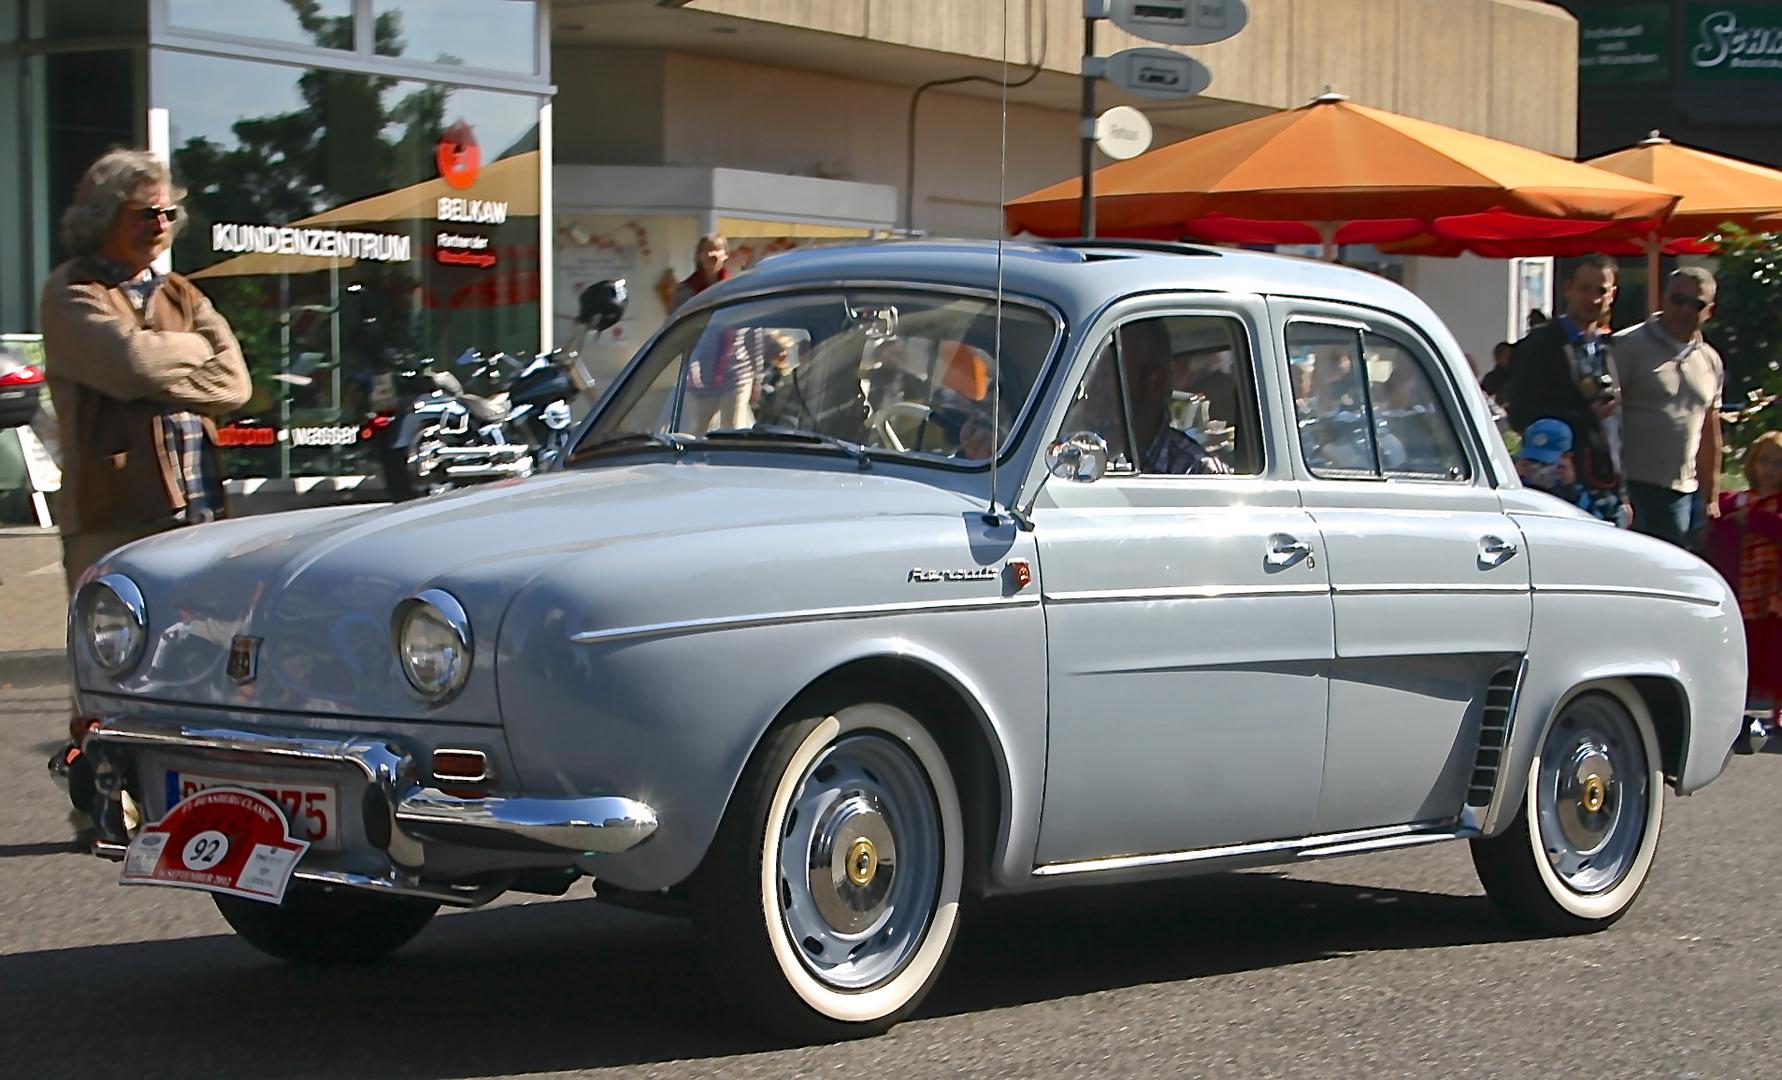 Bensberg Classic 2012 - 05